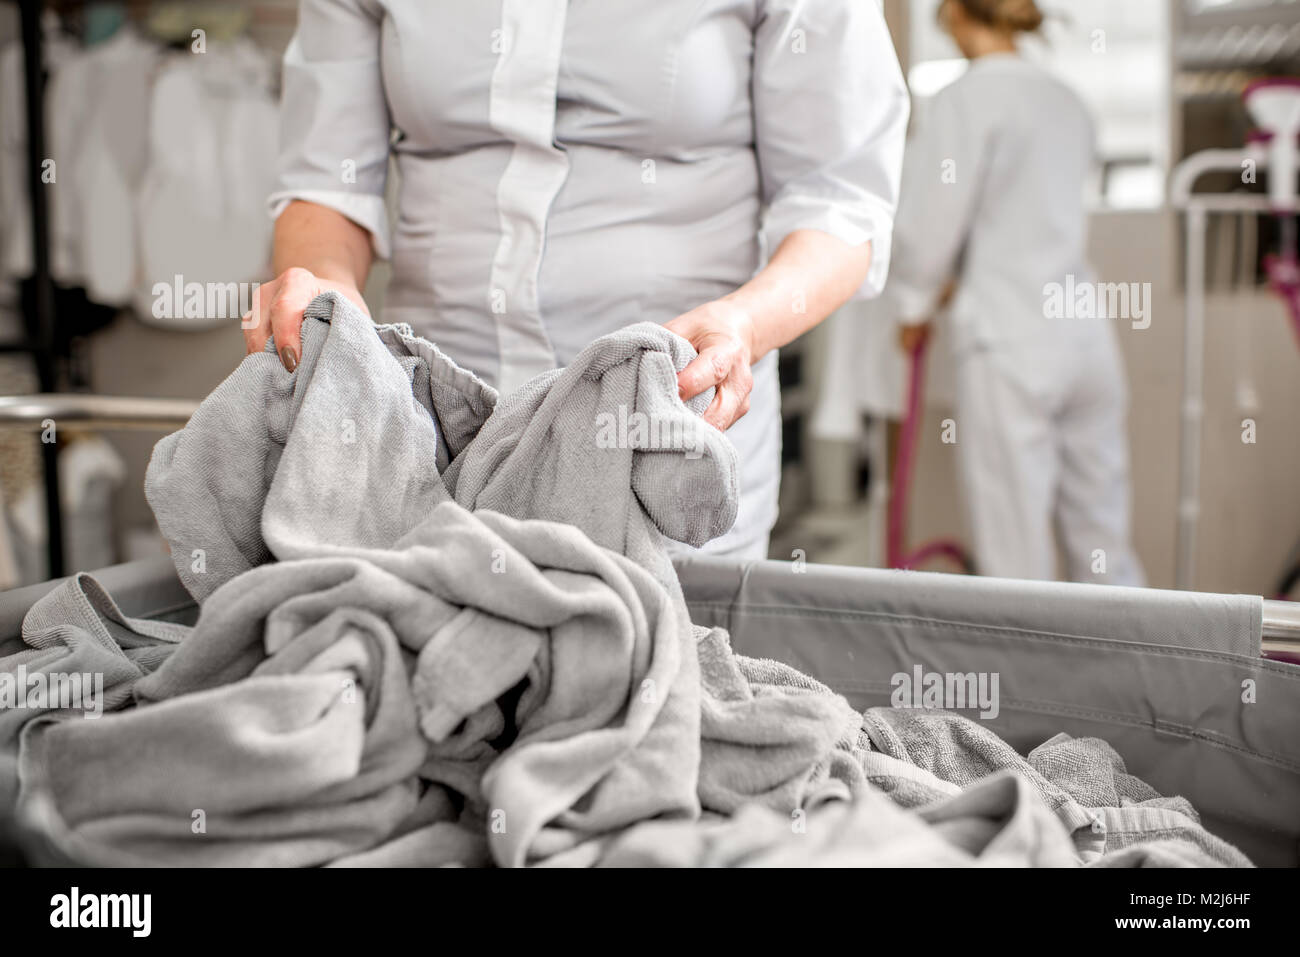 Senior washwoman working in the laundry - Stock Image